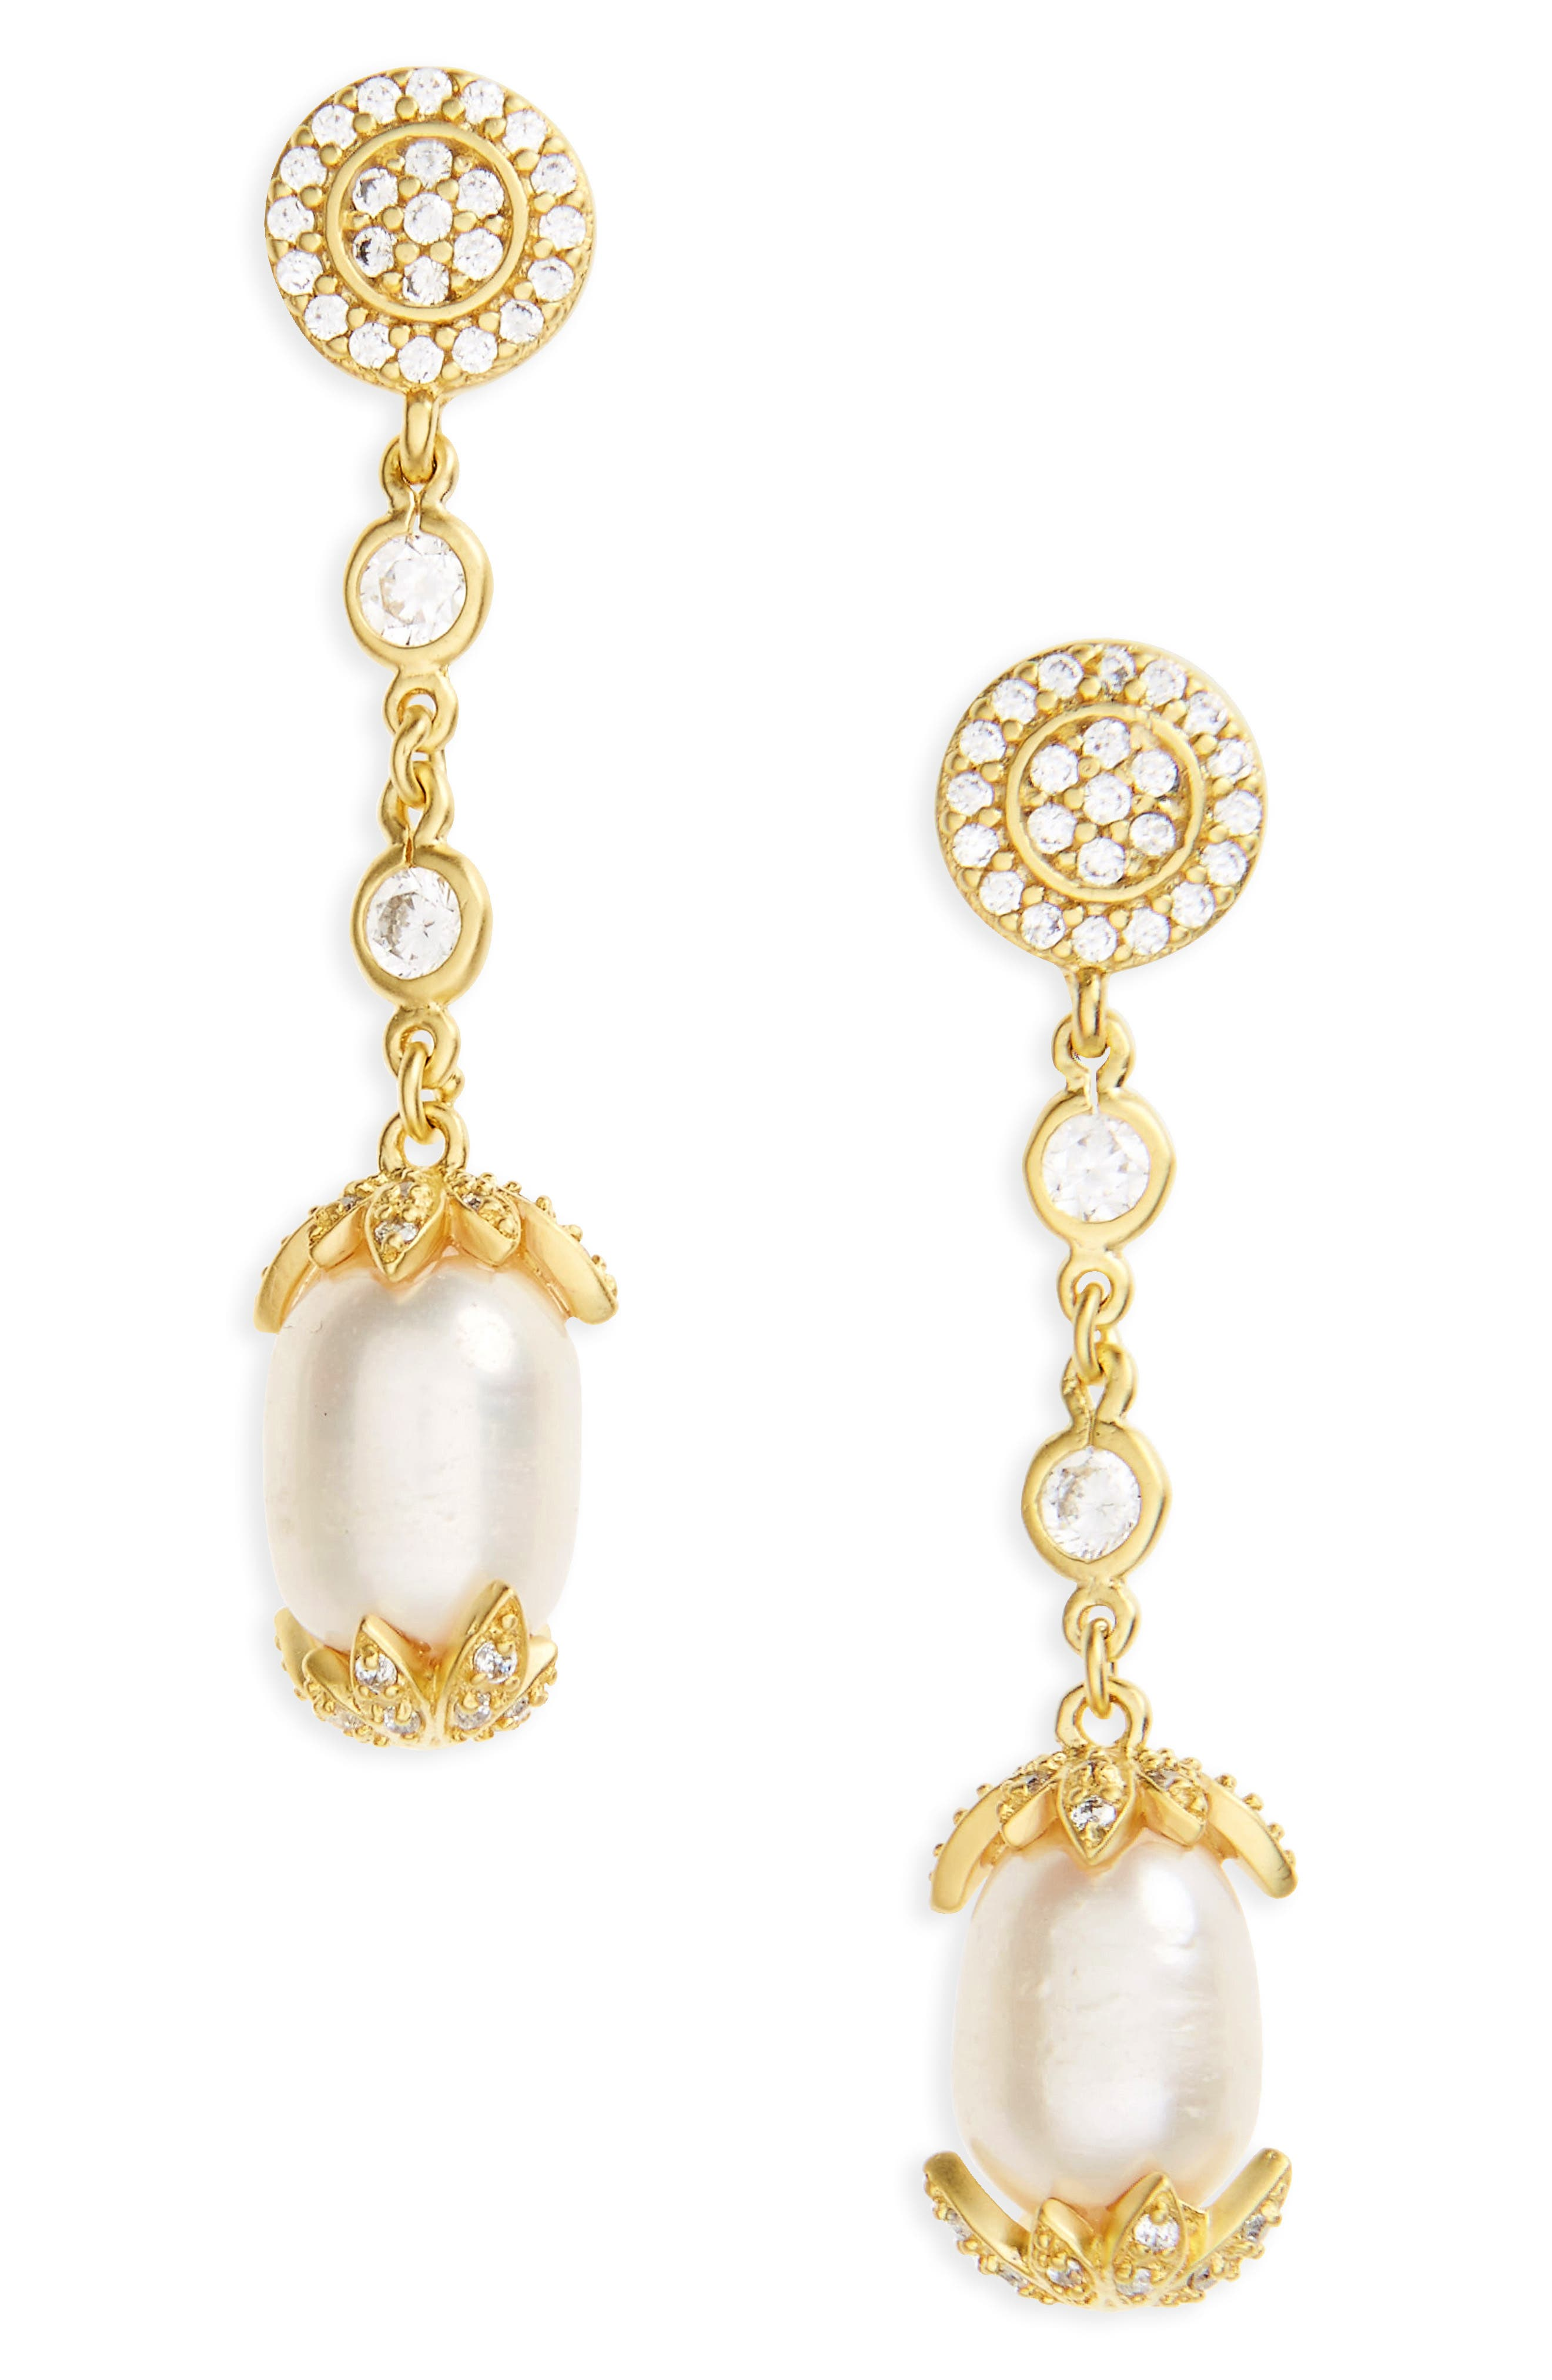 Audrey Linear Drop Earrings,                             Main thumbnail 1, color,